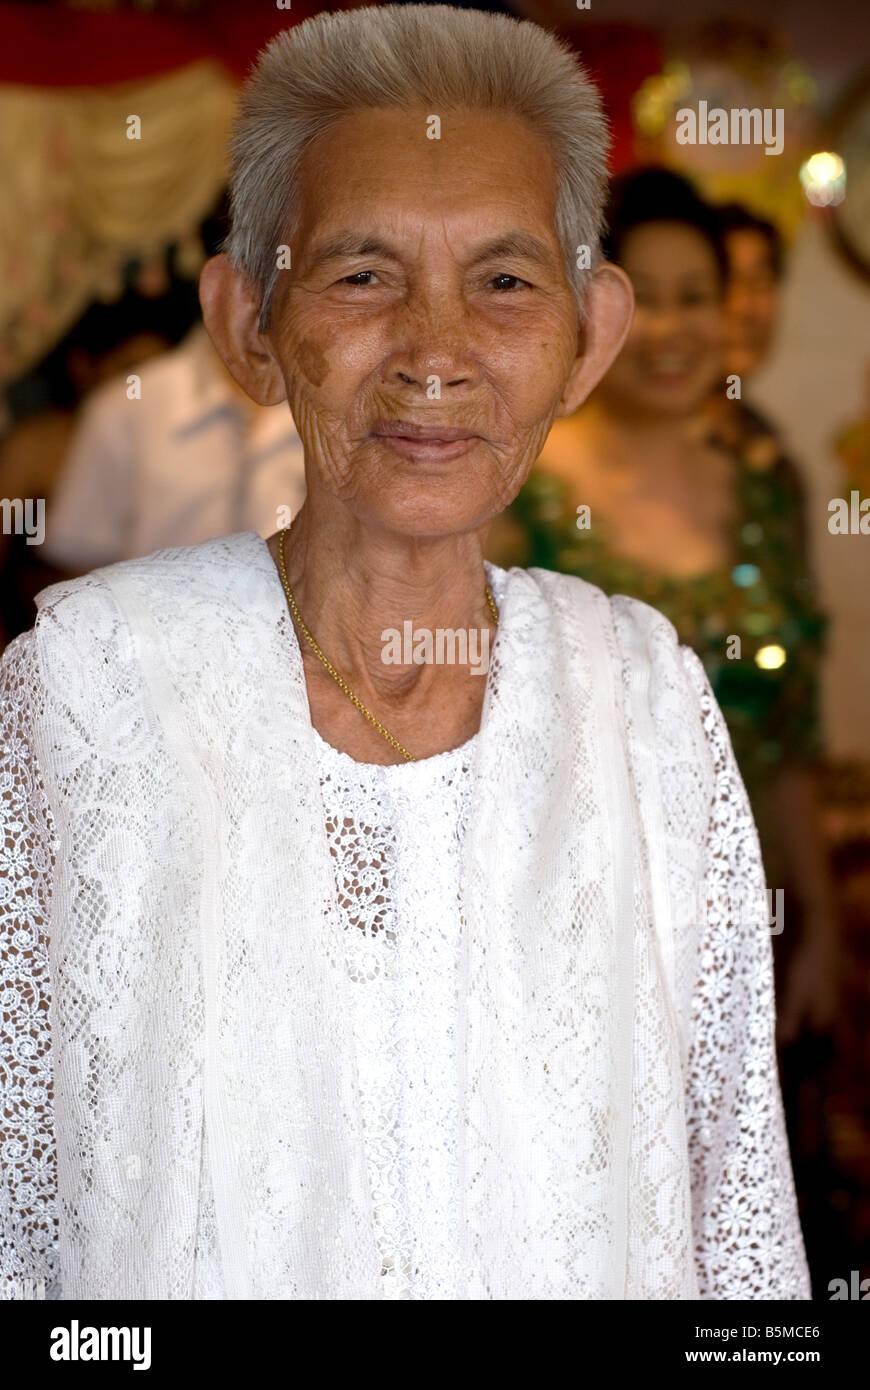 Khmer Wedding Stock Photos & Khmer Wedding Stock Images - Alamy